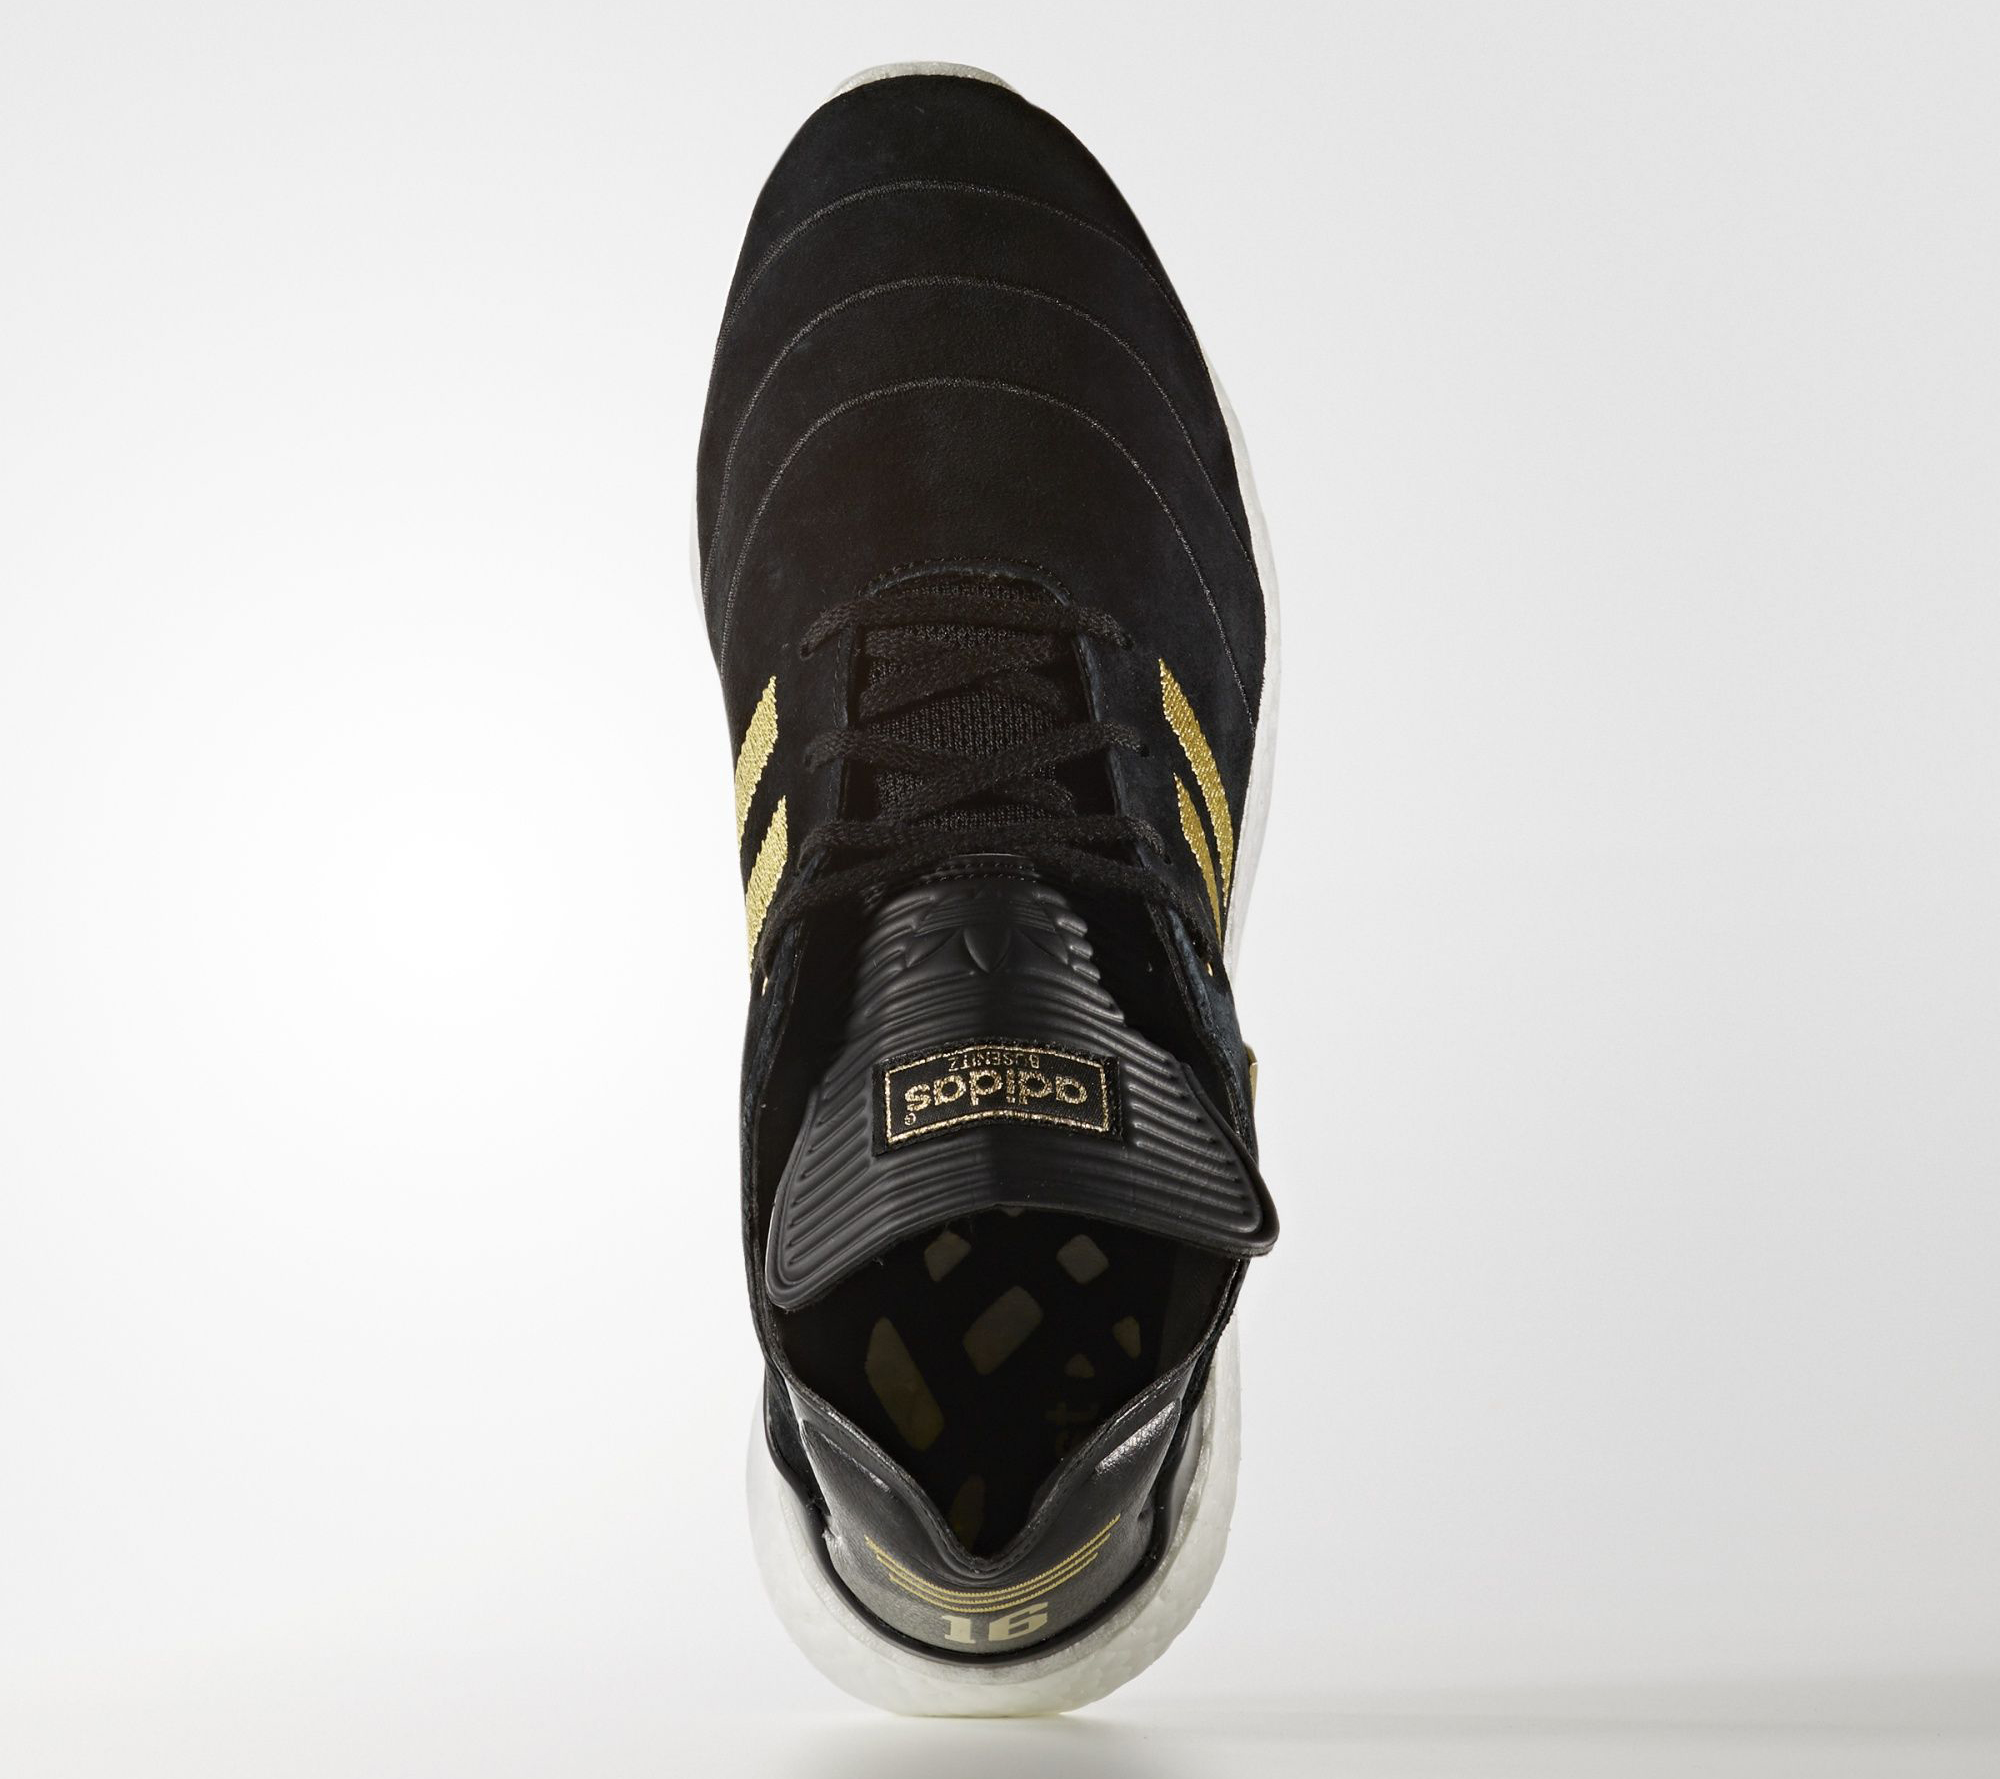 Adidas Busenitz 10 Year Anniversary Black Gold Top